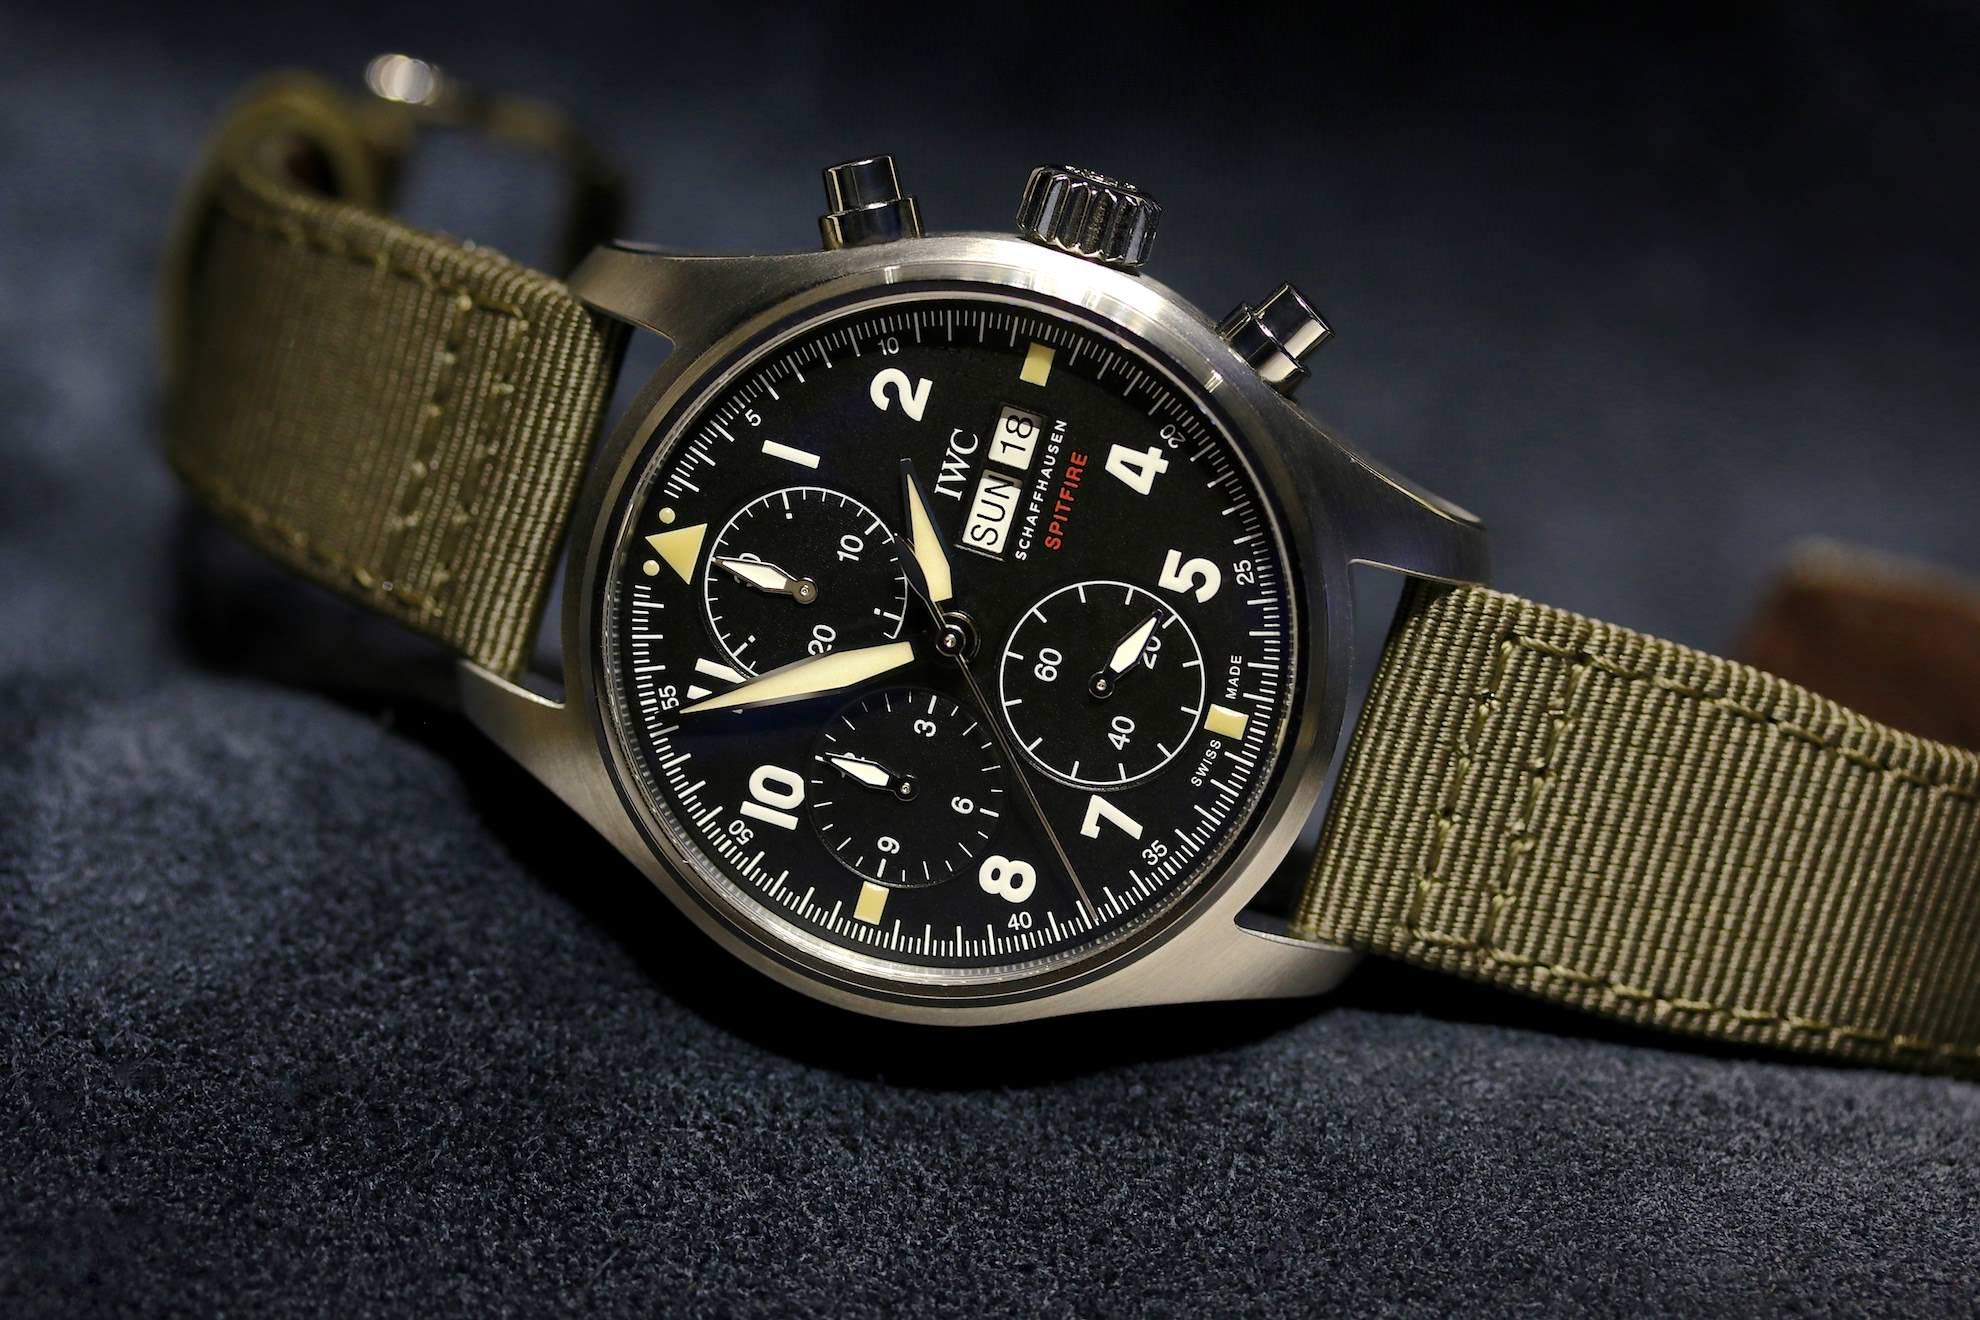 IWC_Pilots_Watch_Chronograph_Spitfire_2